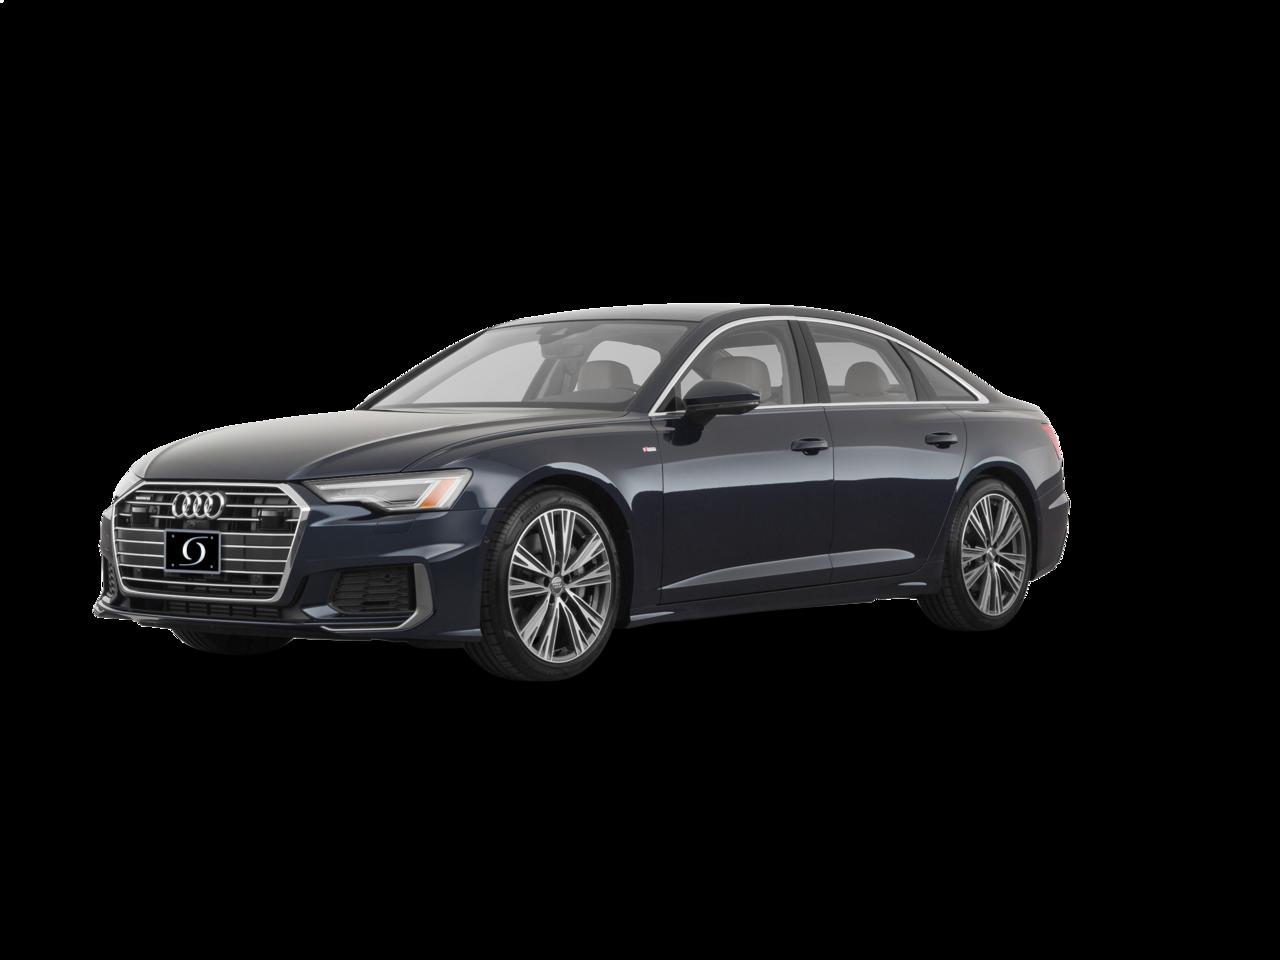 2021 Audi A6 45 Sport Premium Plus Lease Deal